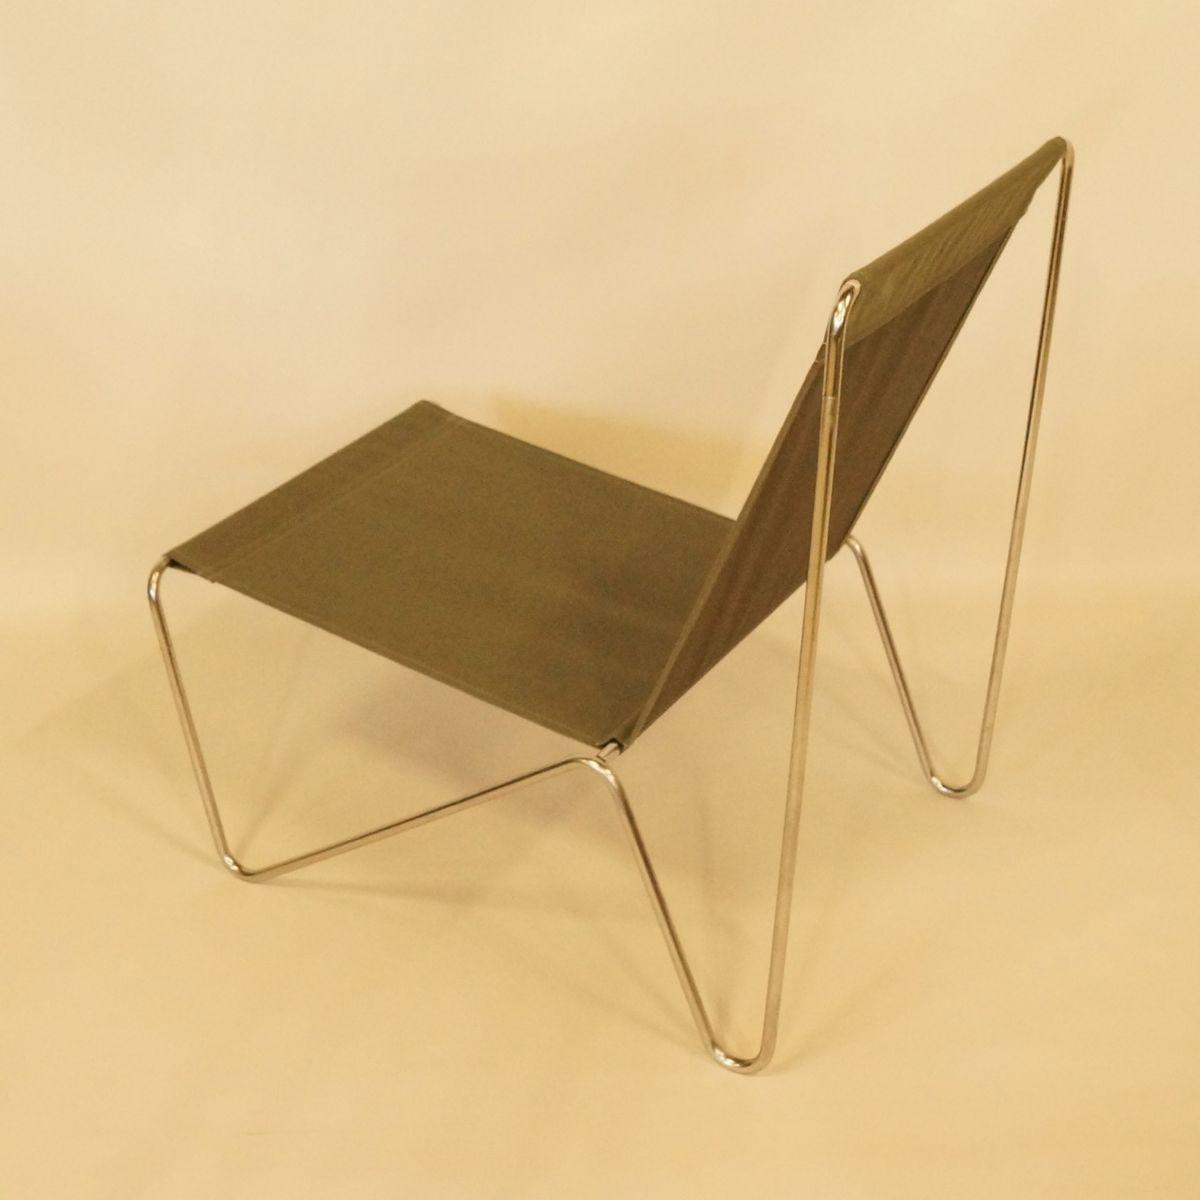 Original Panton Chair bachelor chair by verner panton for fritz hansen 1955 for sale at pamono